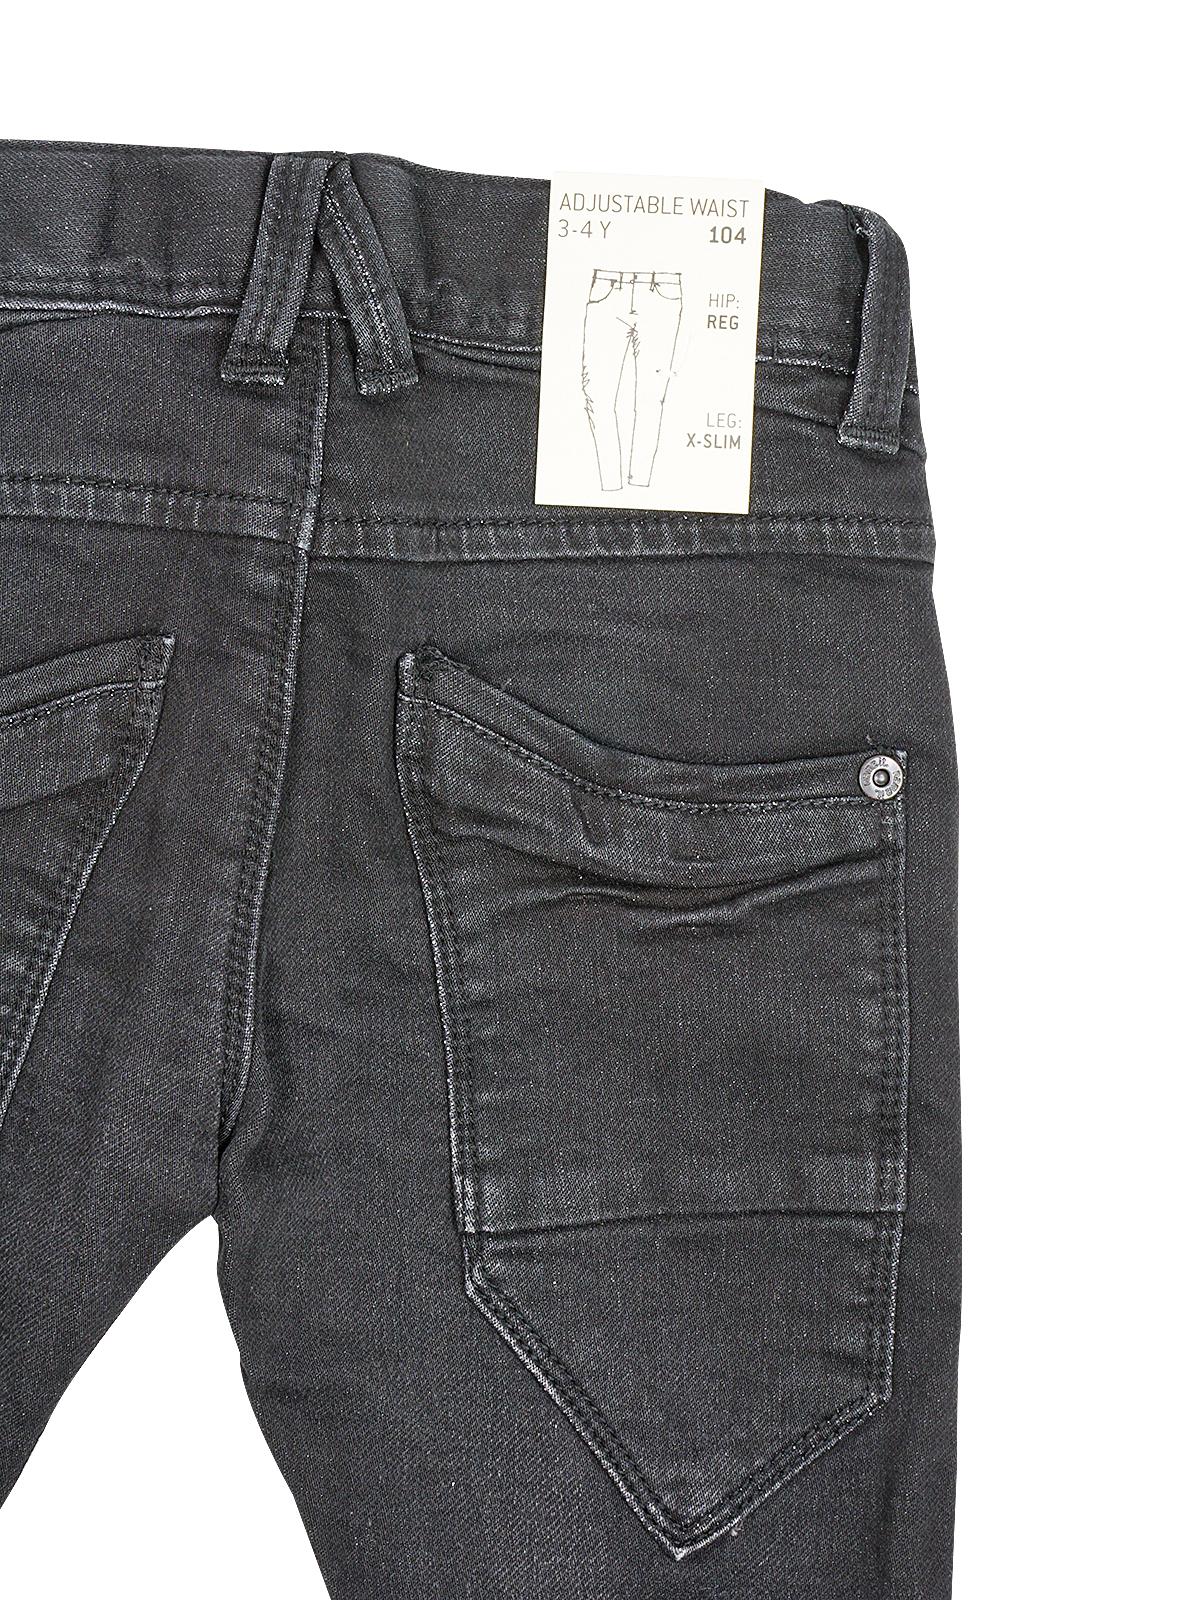 Name it Nittom Denim Jungen Jeans Regular Straight Kinder Jungs Hose Schwarz